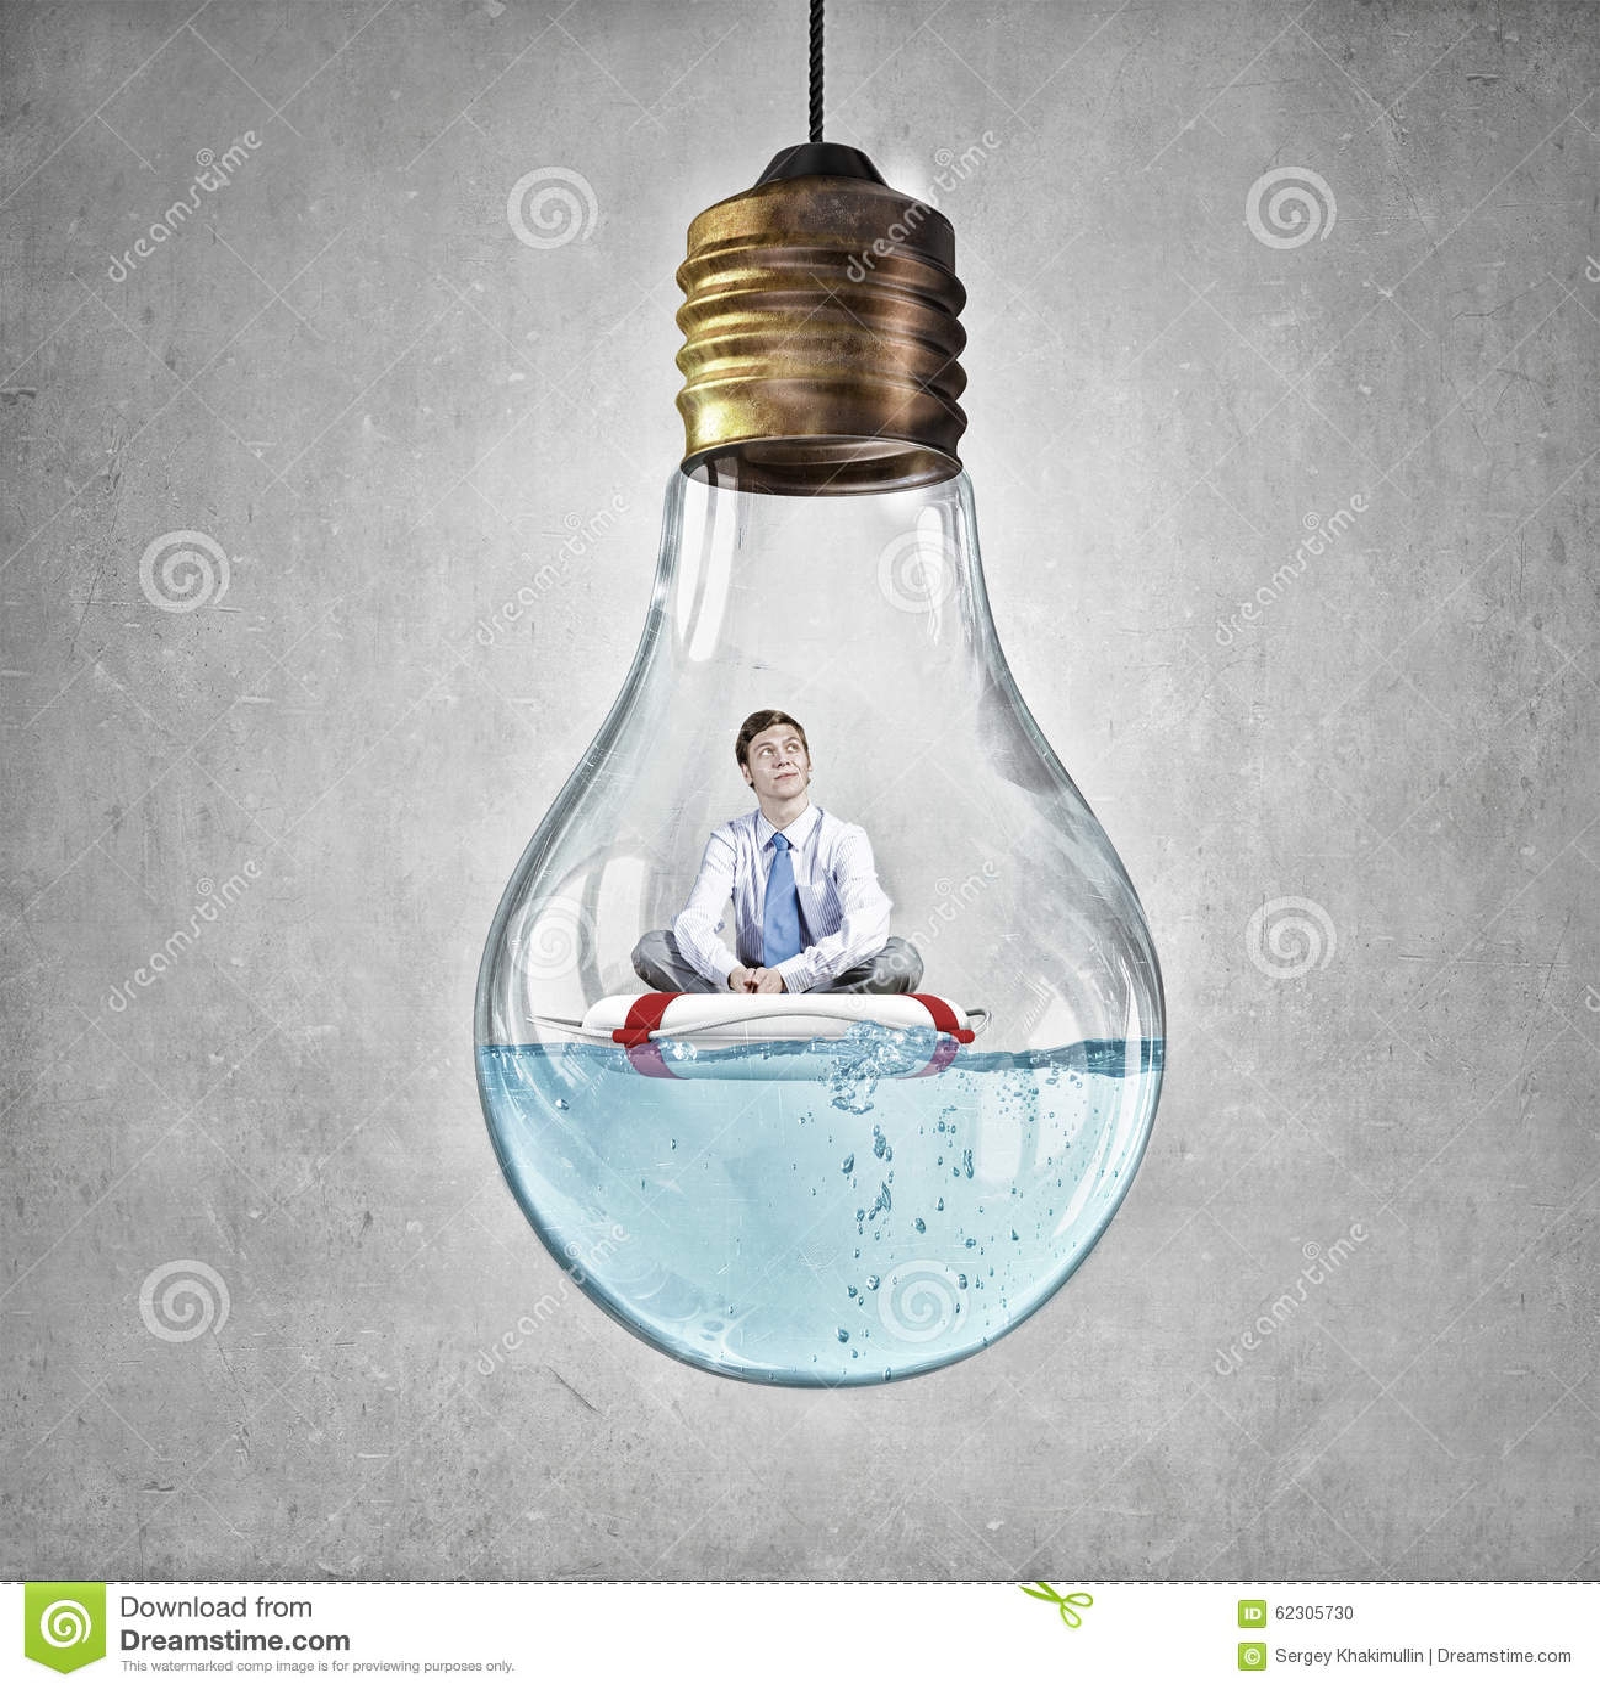 man inside light bulb stock photo image of handsome 62305730